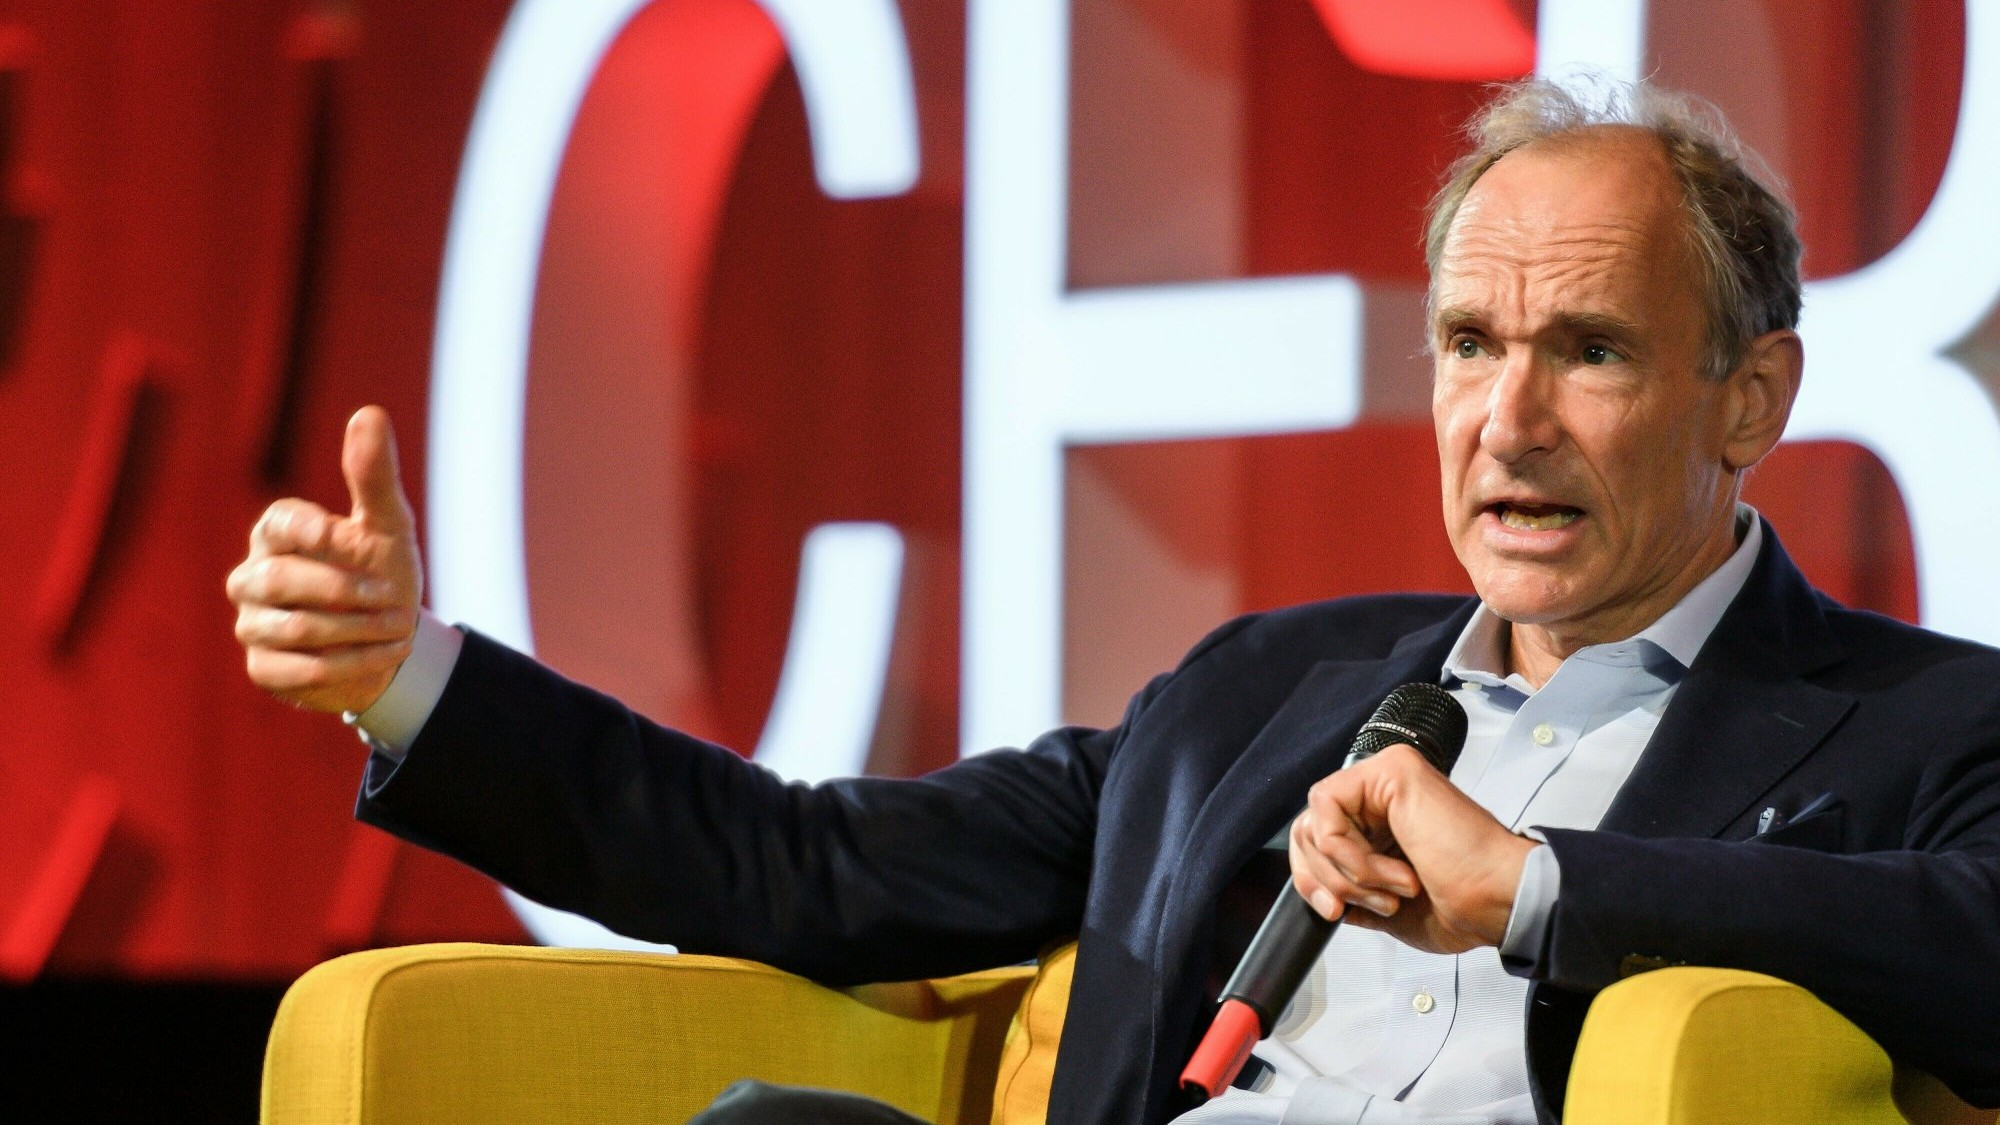 Tim Berners-Lee_1552438523279.jpeg.jpg